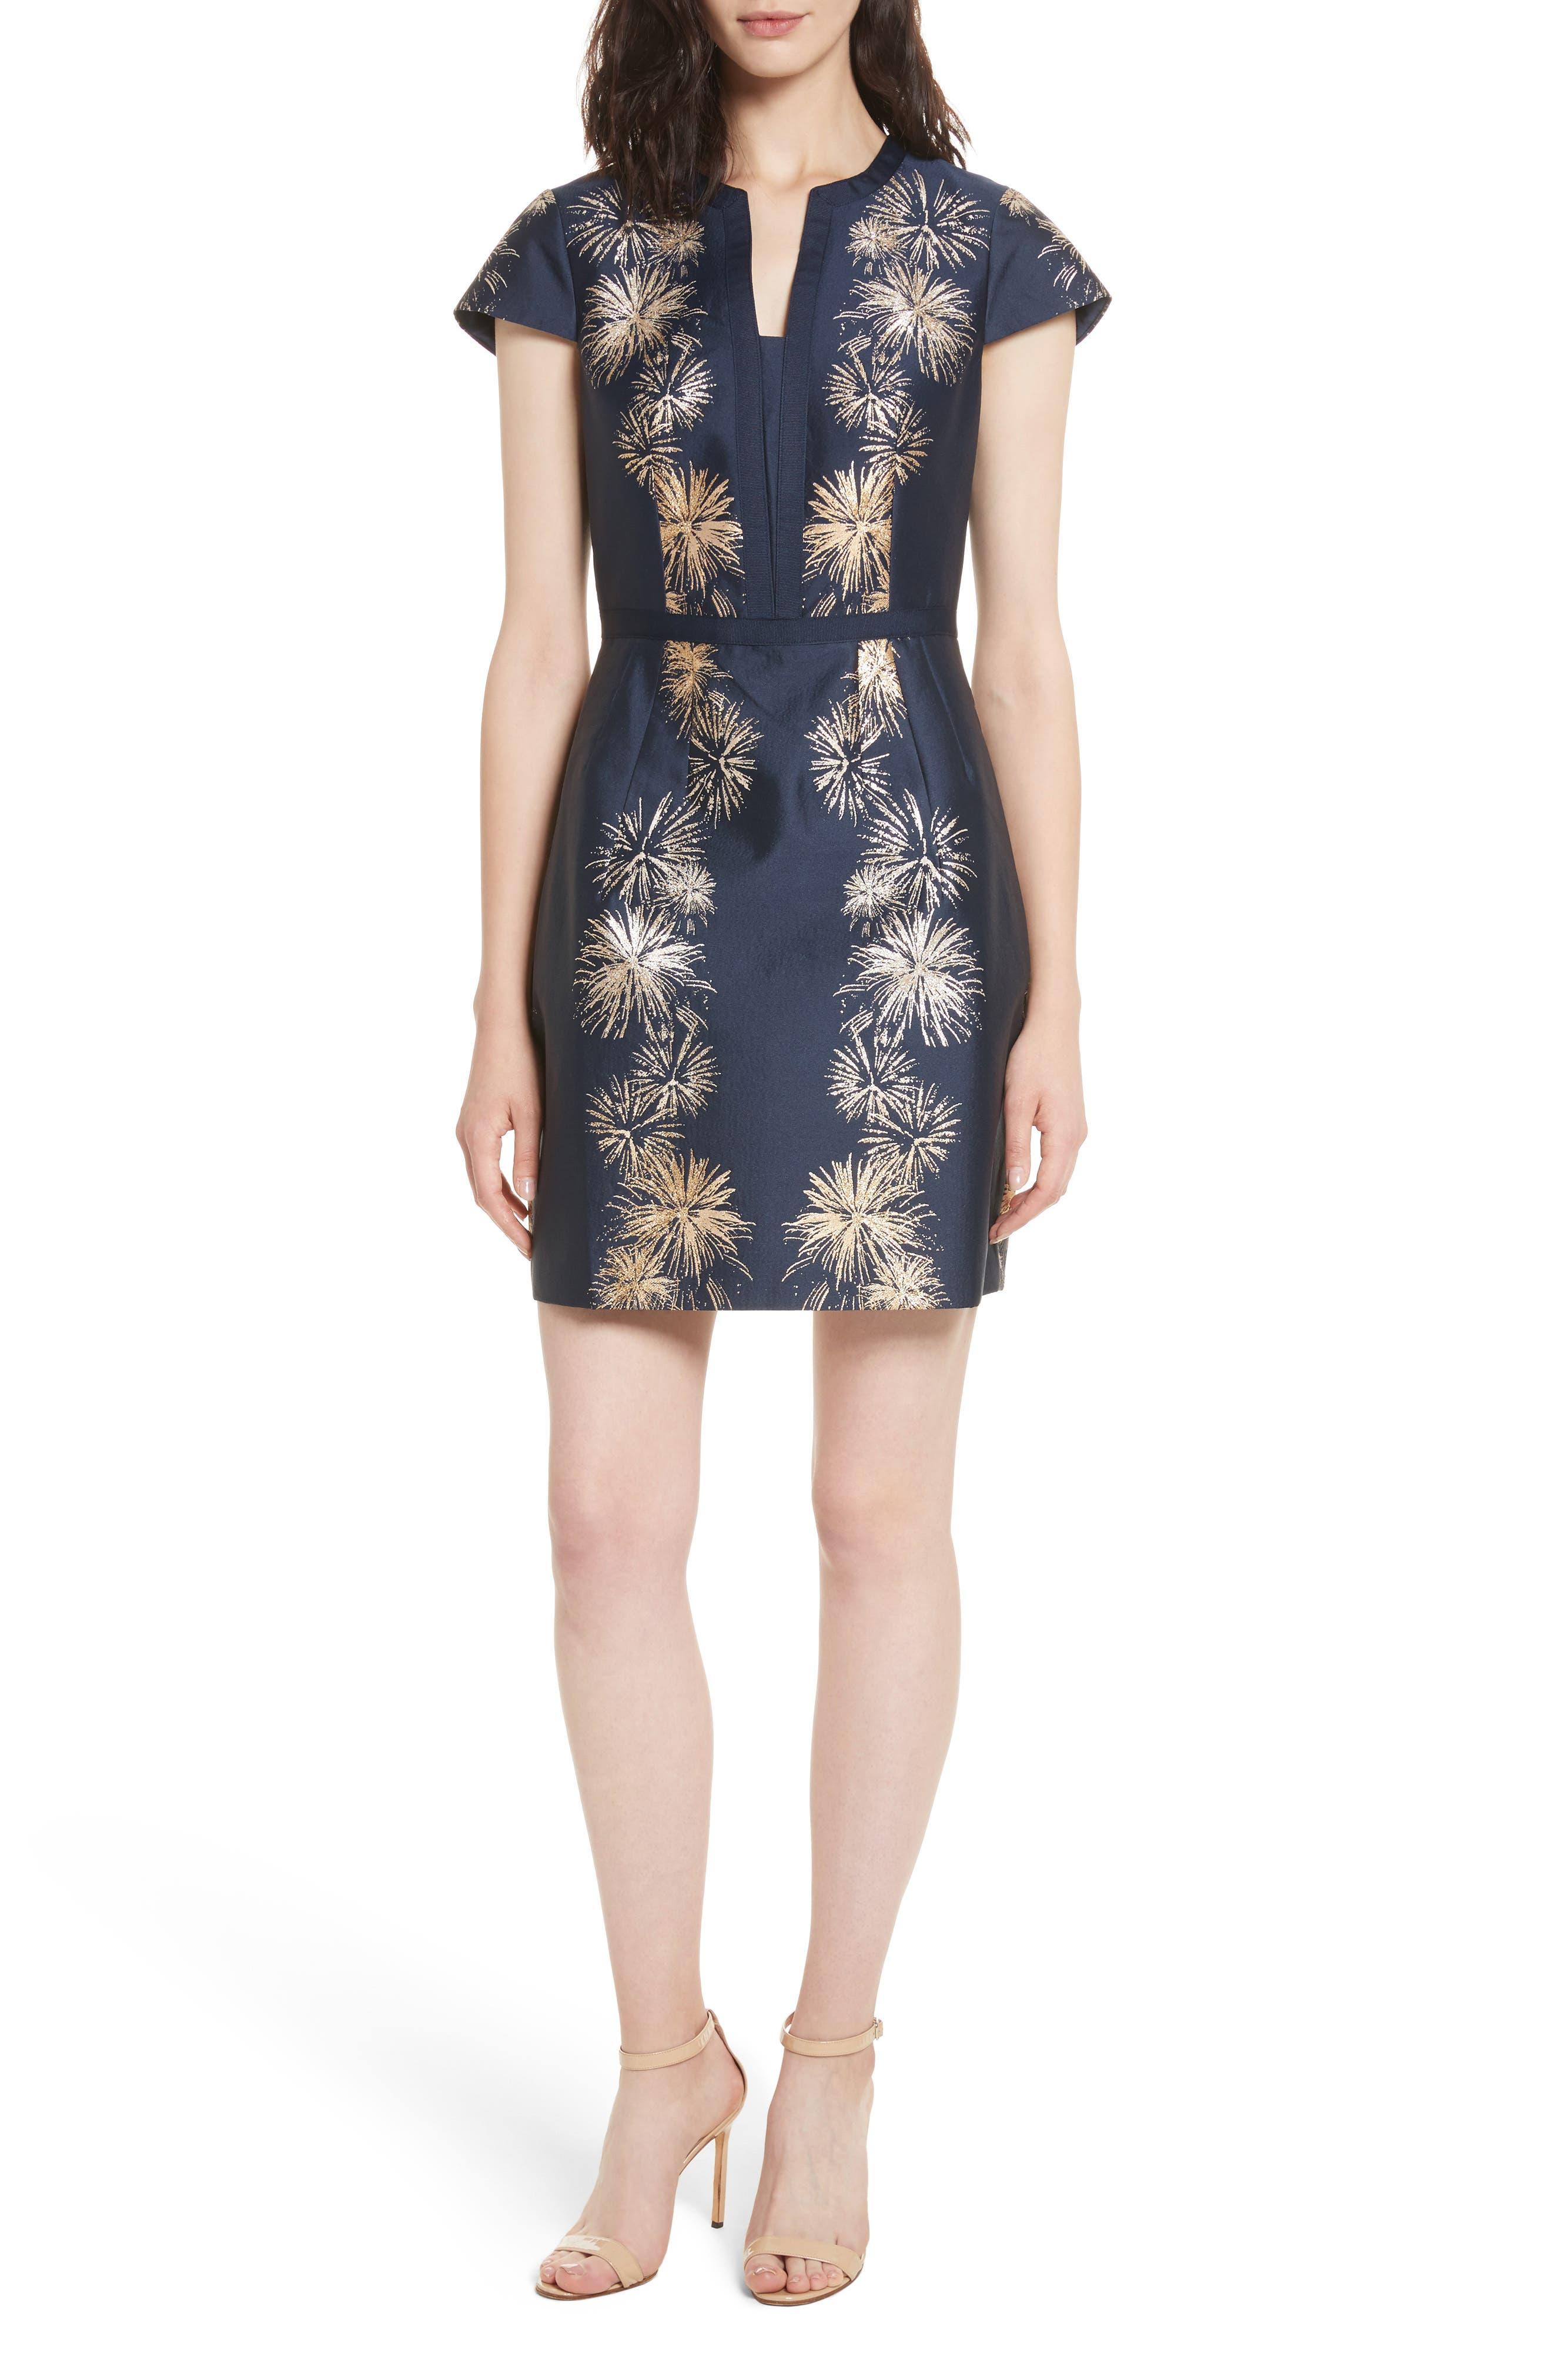 Alternate Image 1 Selected - Ted Baker London Tzalla Sculpted Stardust Jacquard Dress